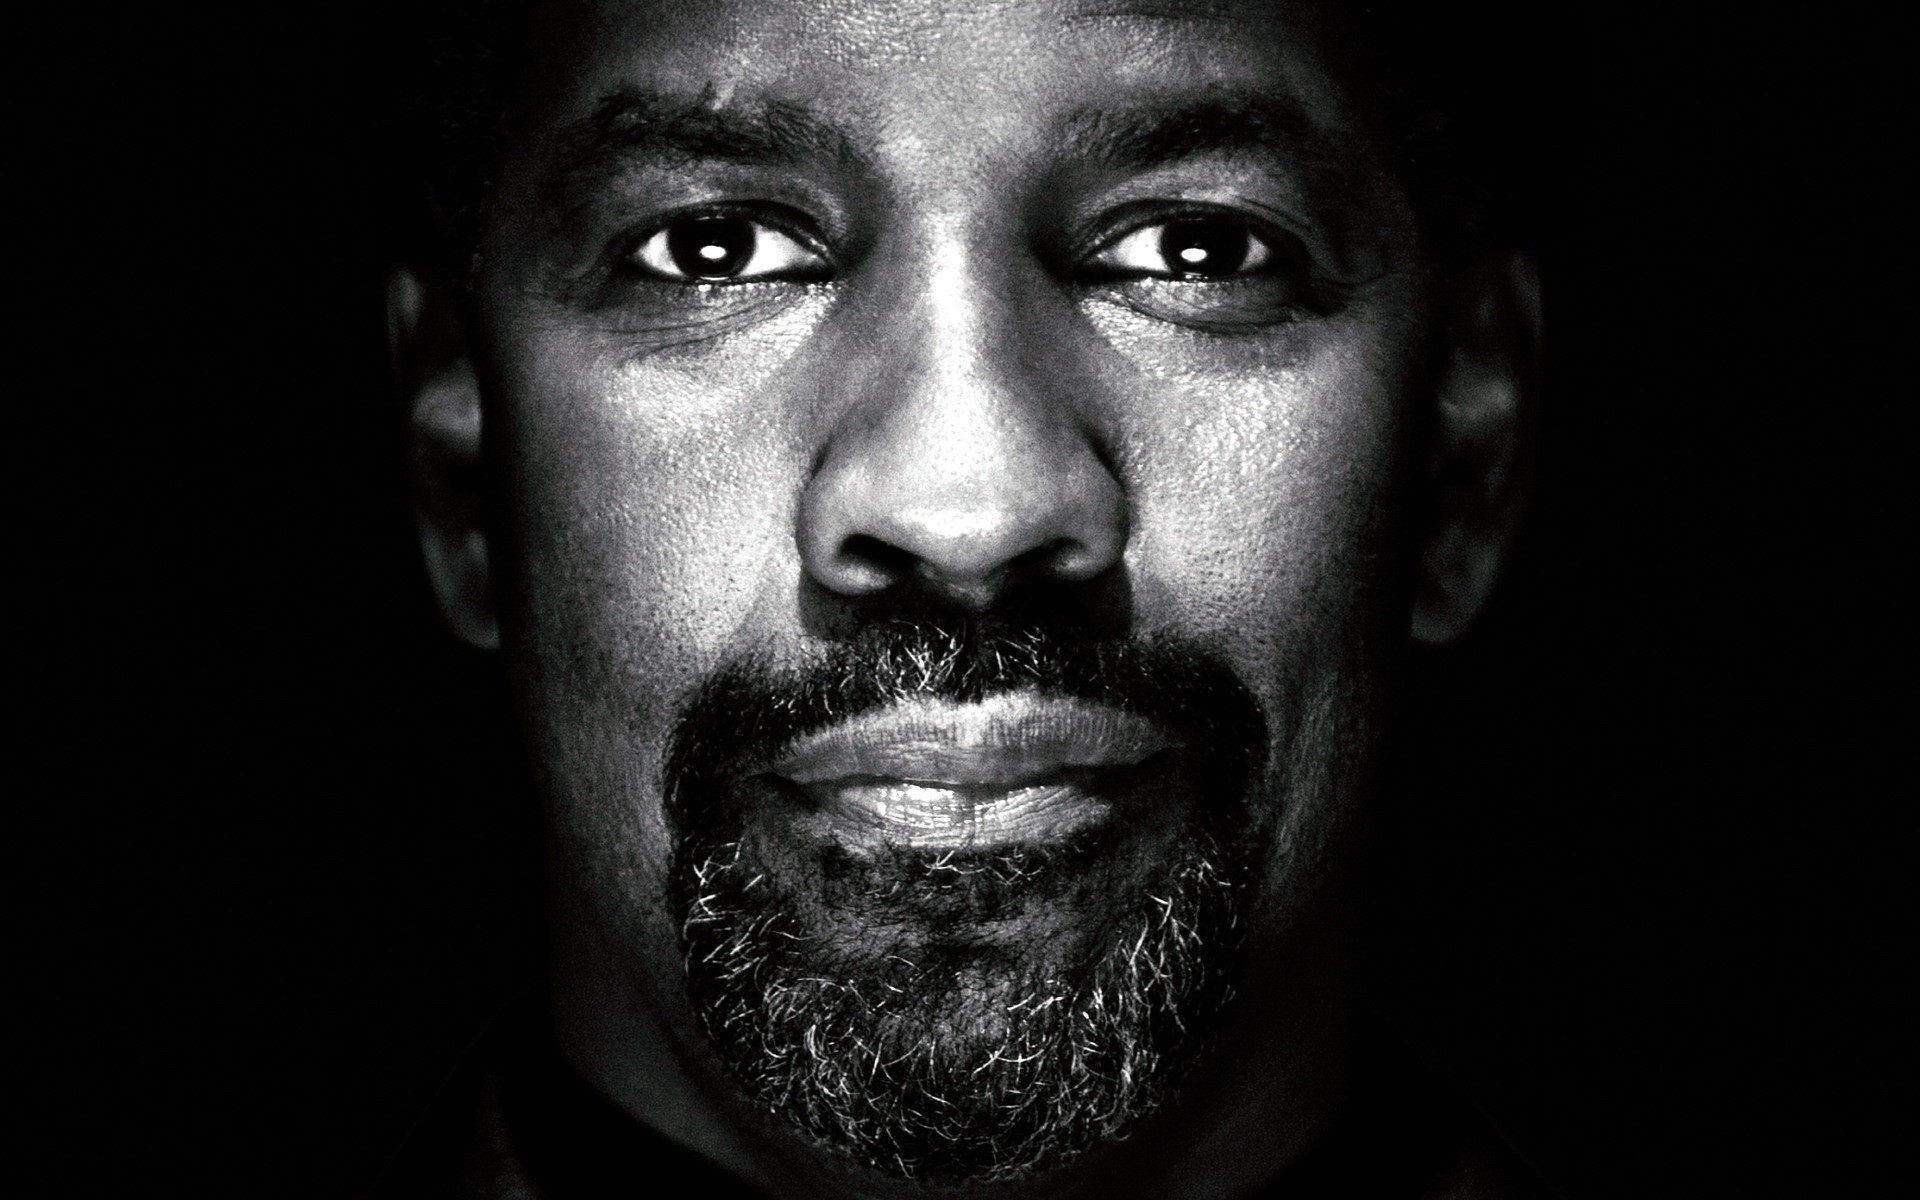 Sony Hack Studio Warned Not To Cast Denzel Washington Due